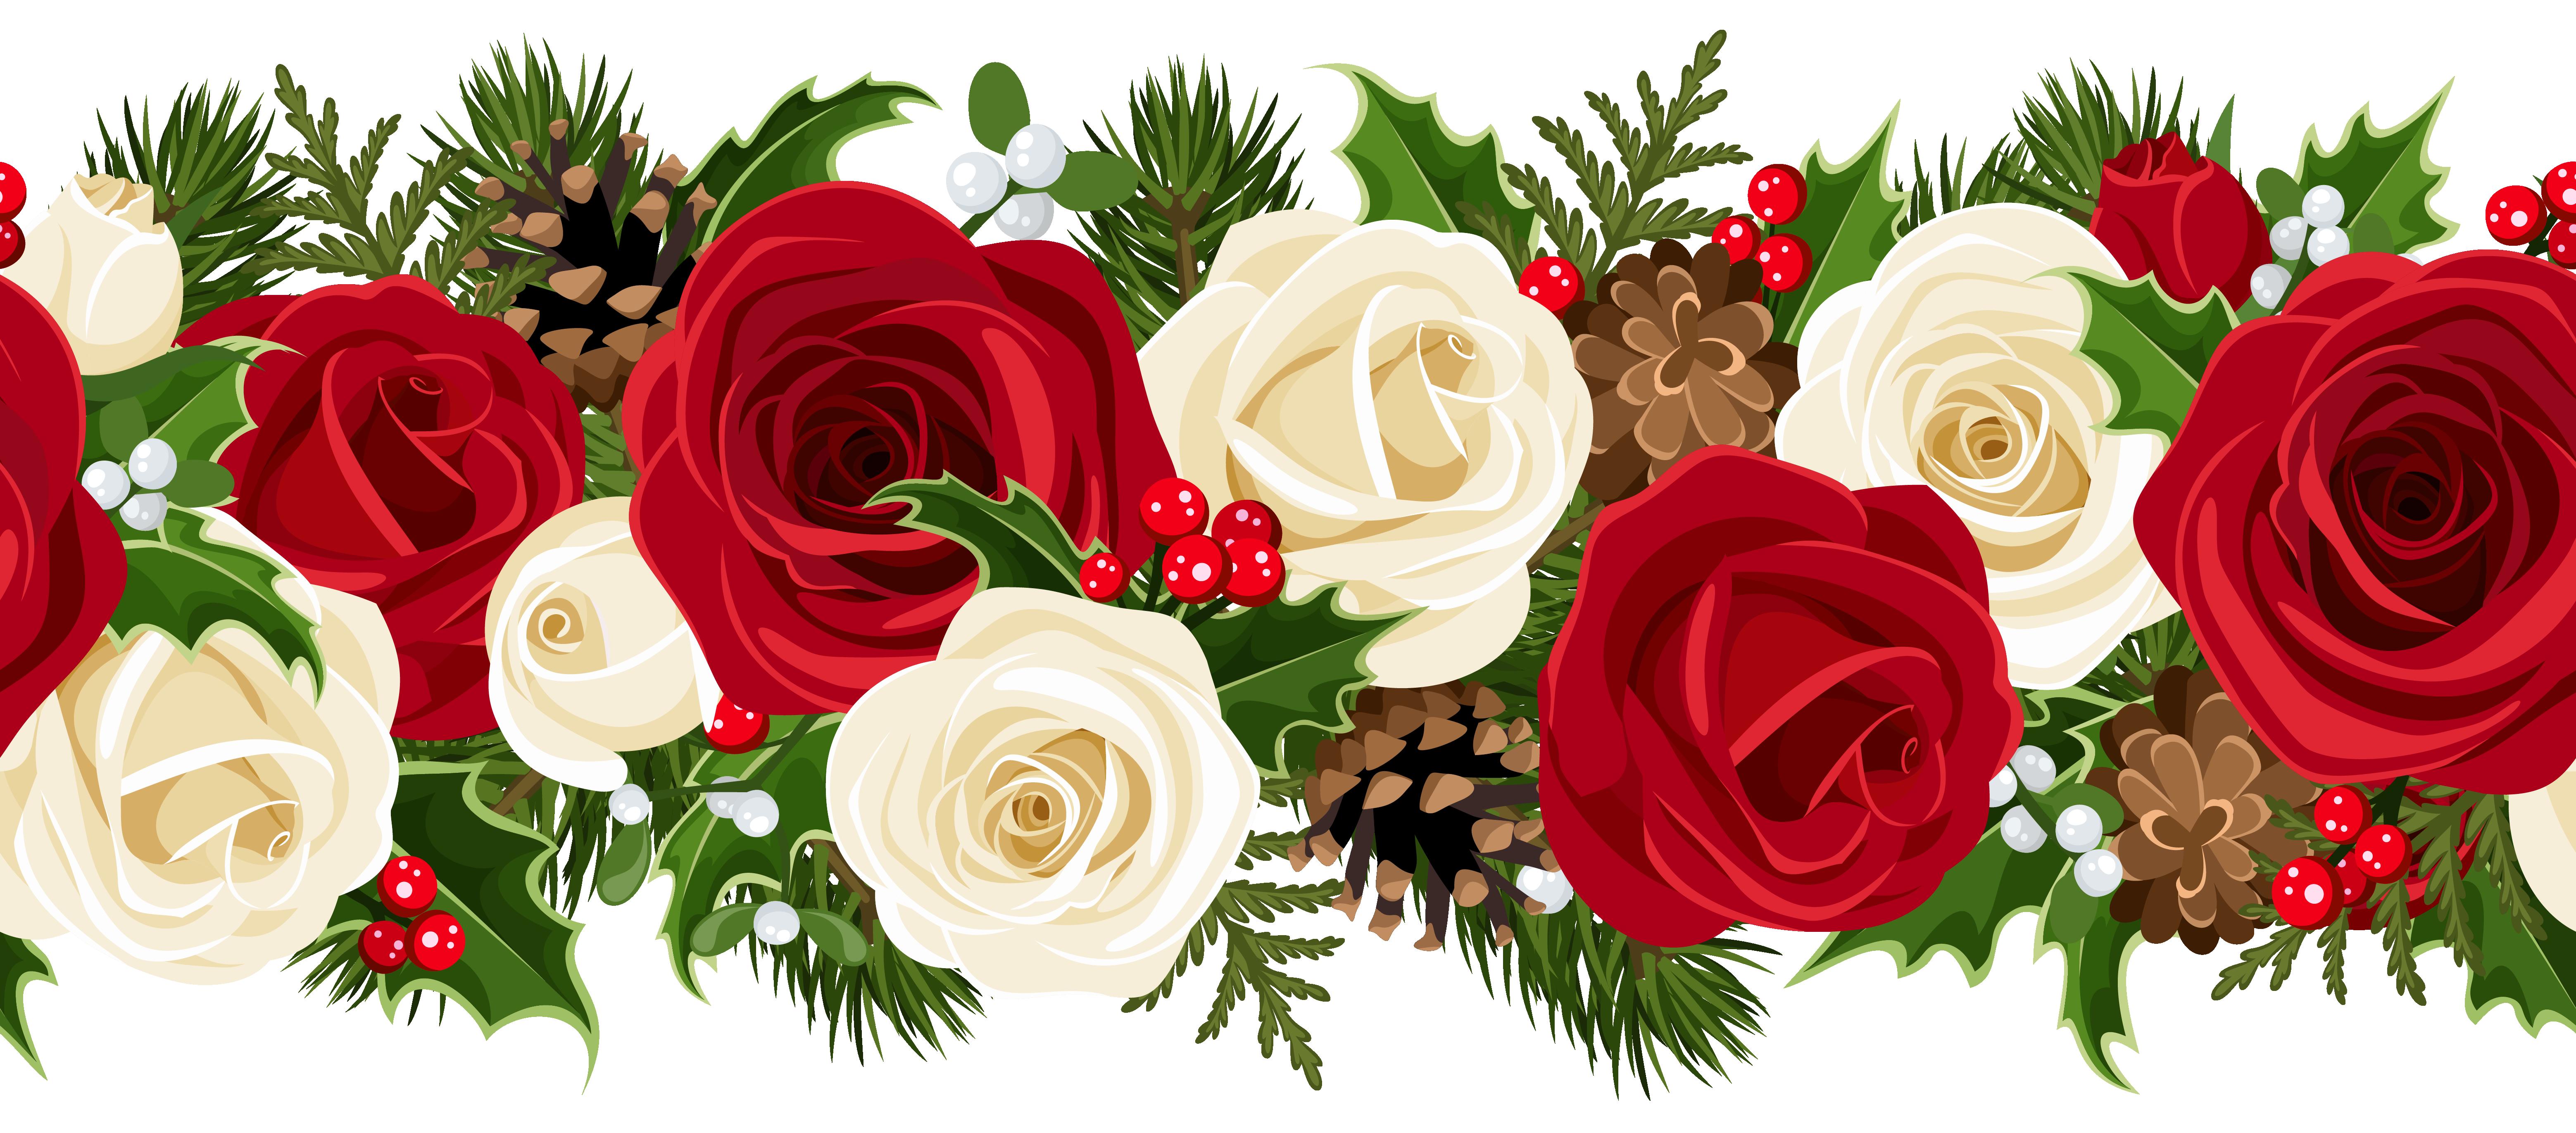 Christmas Rose Garland PNG Clip Art Image.